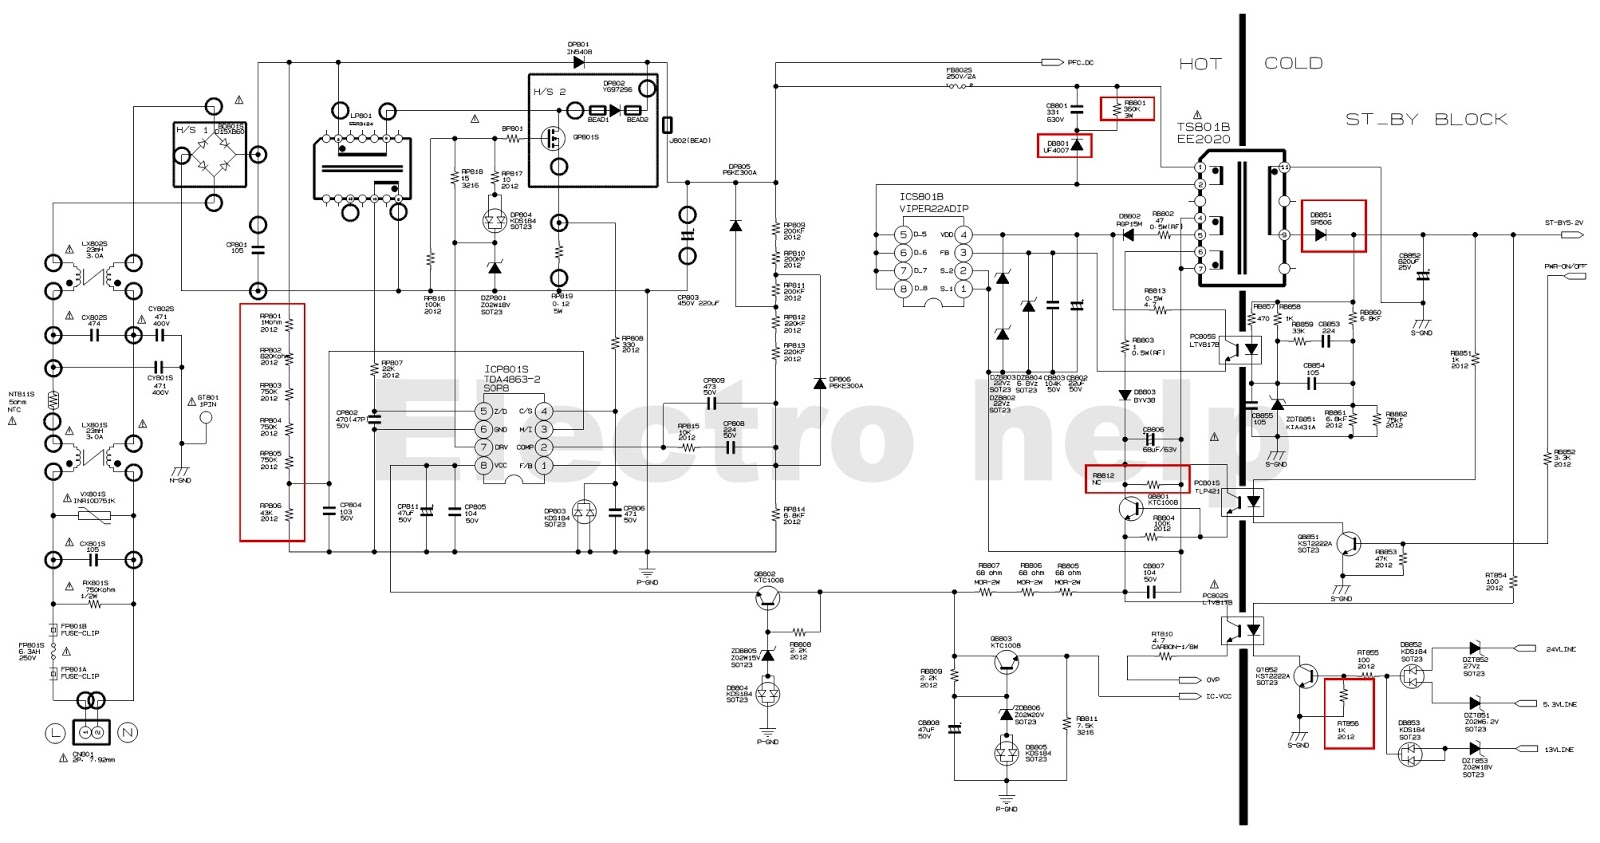 diagram sony led tv diagram full version hd quality tv diagram samsung tv schematic diagram [ 1600 x 843 Pixel ]